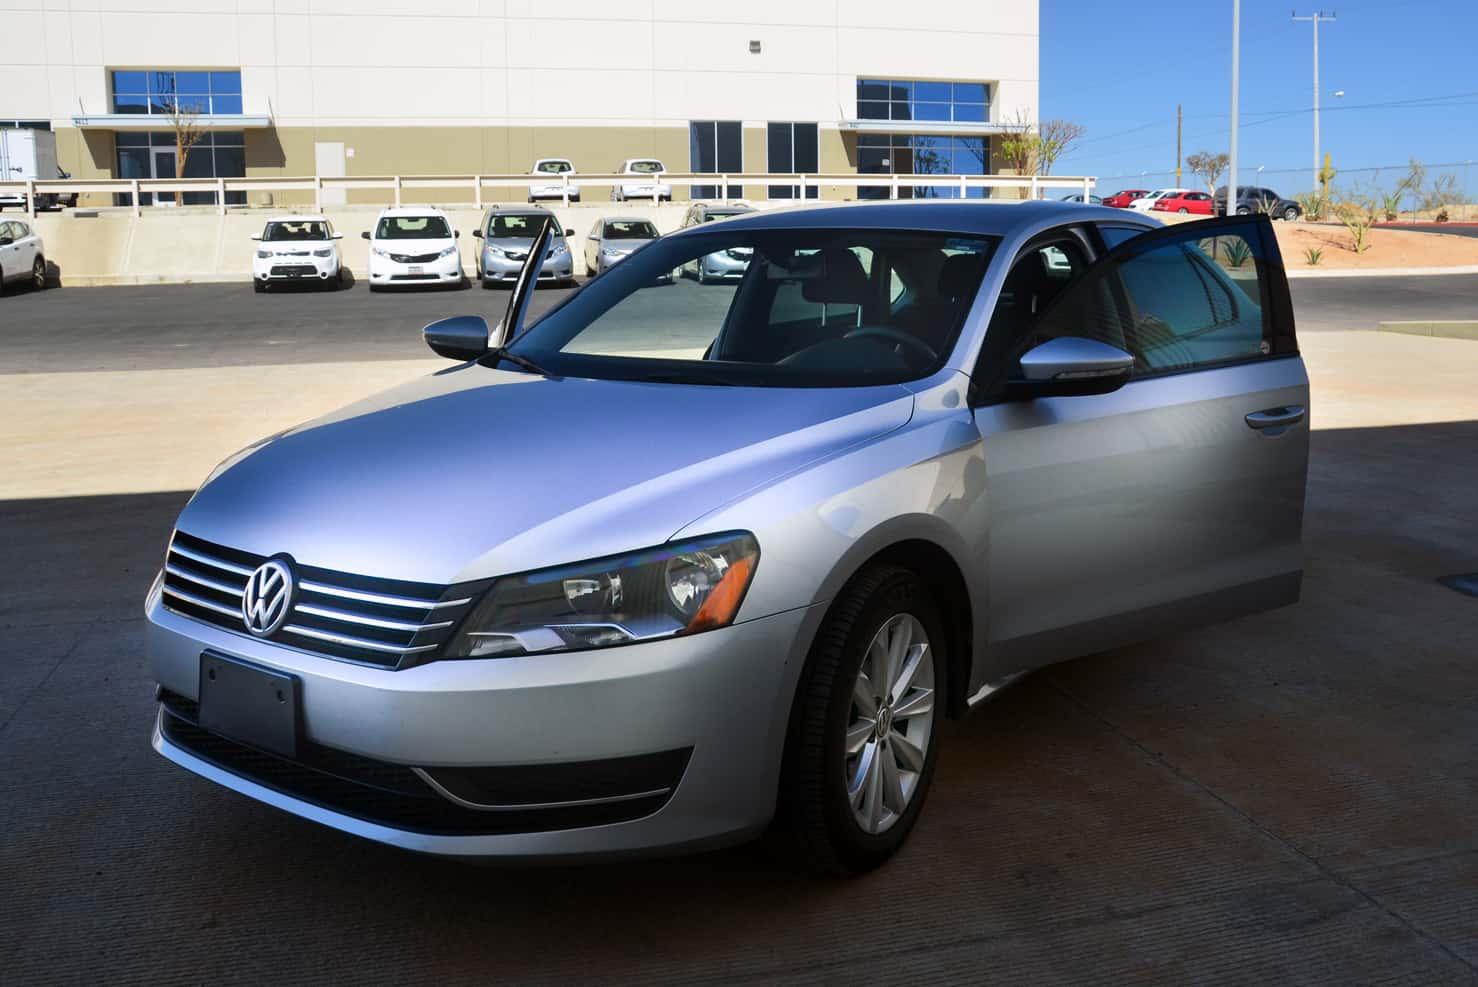 Volkswagen Passat Luxury Sedans | BBB Rent a Car